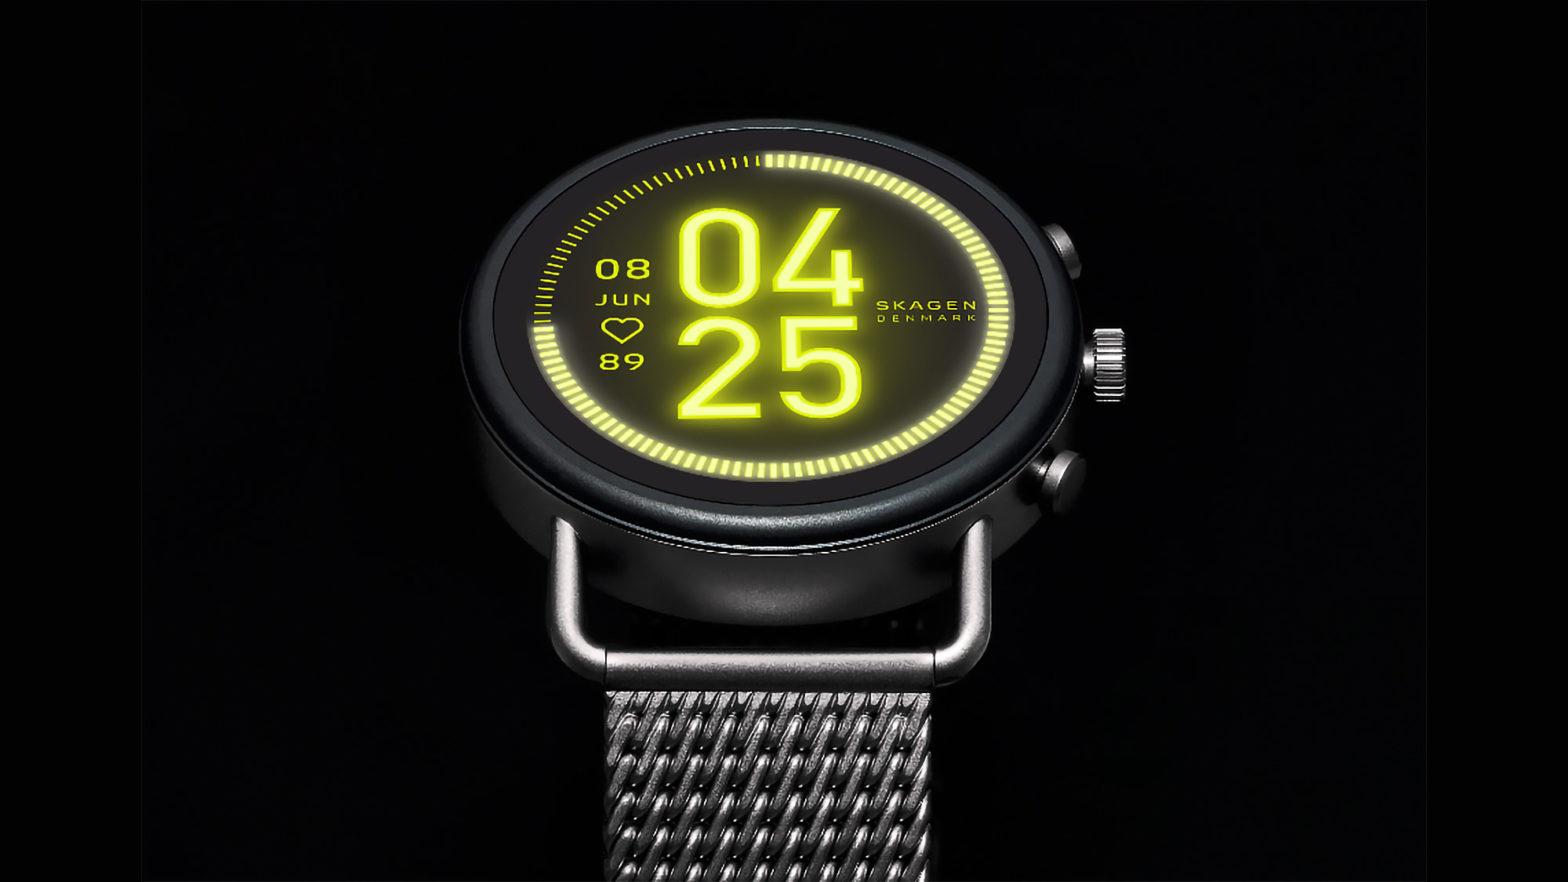 Skagen Falster 3 Smartwatch $295